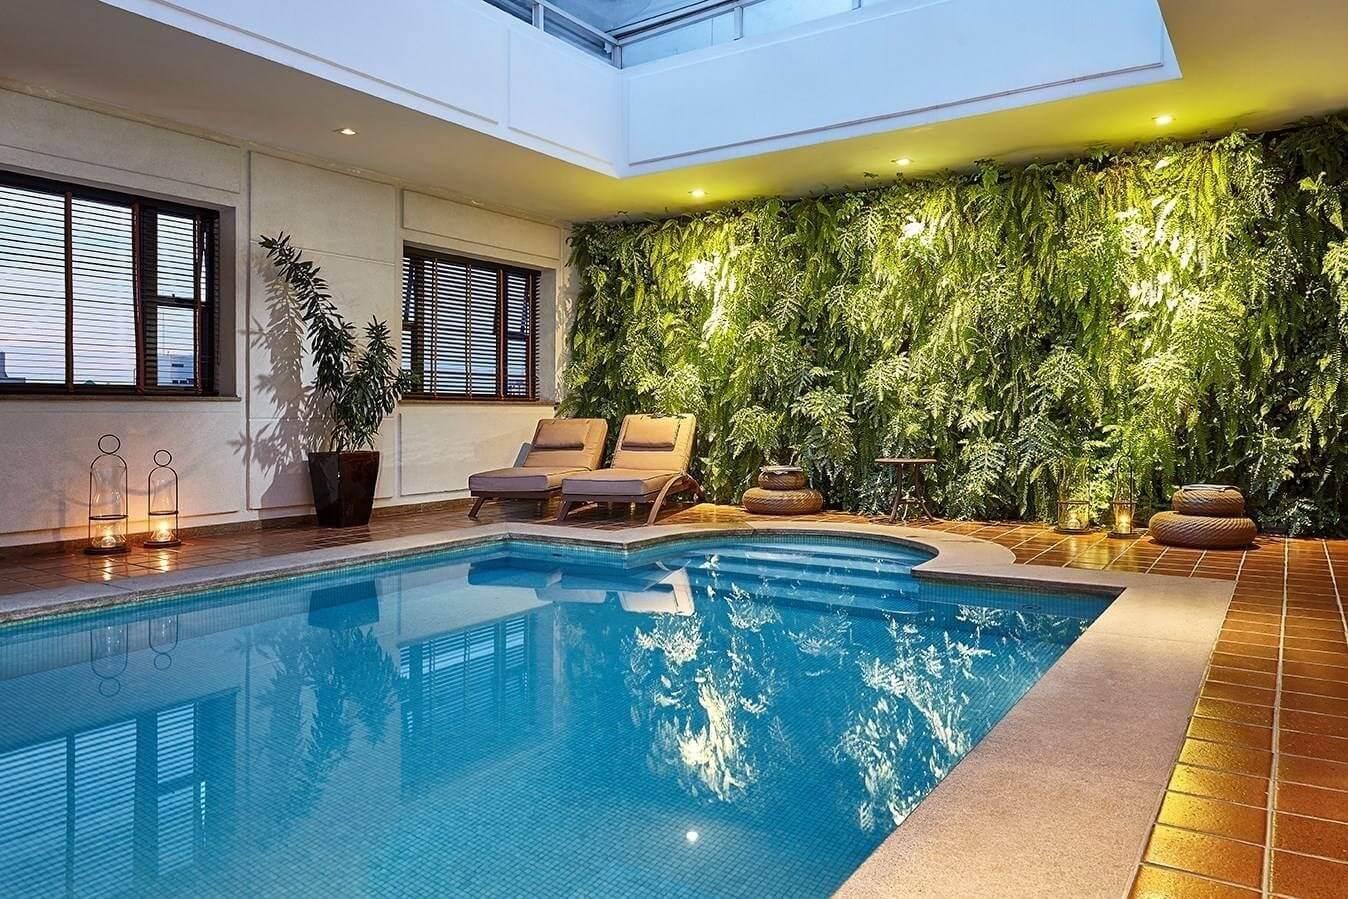 L'Hotel PortoBay São Paulo - Pool